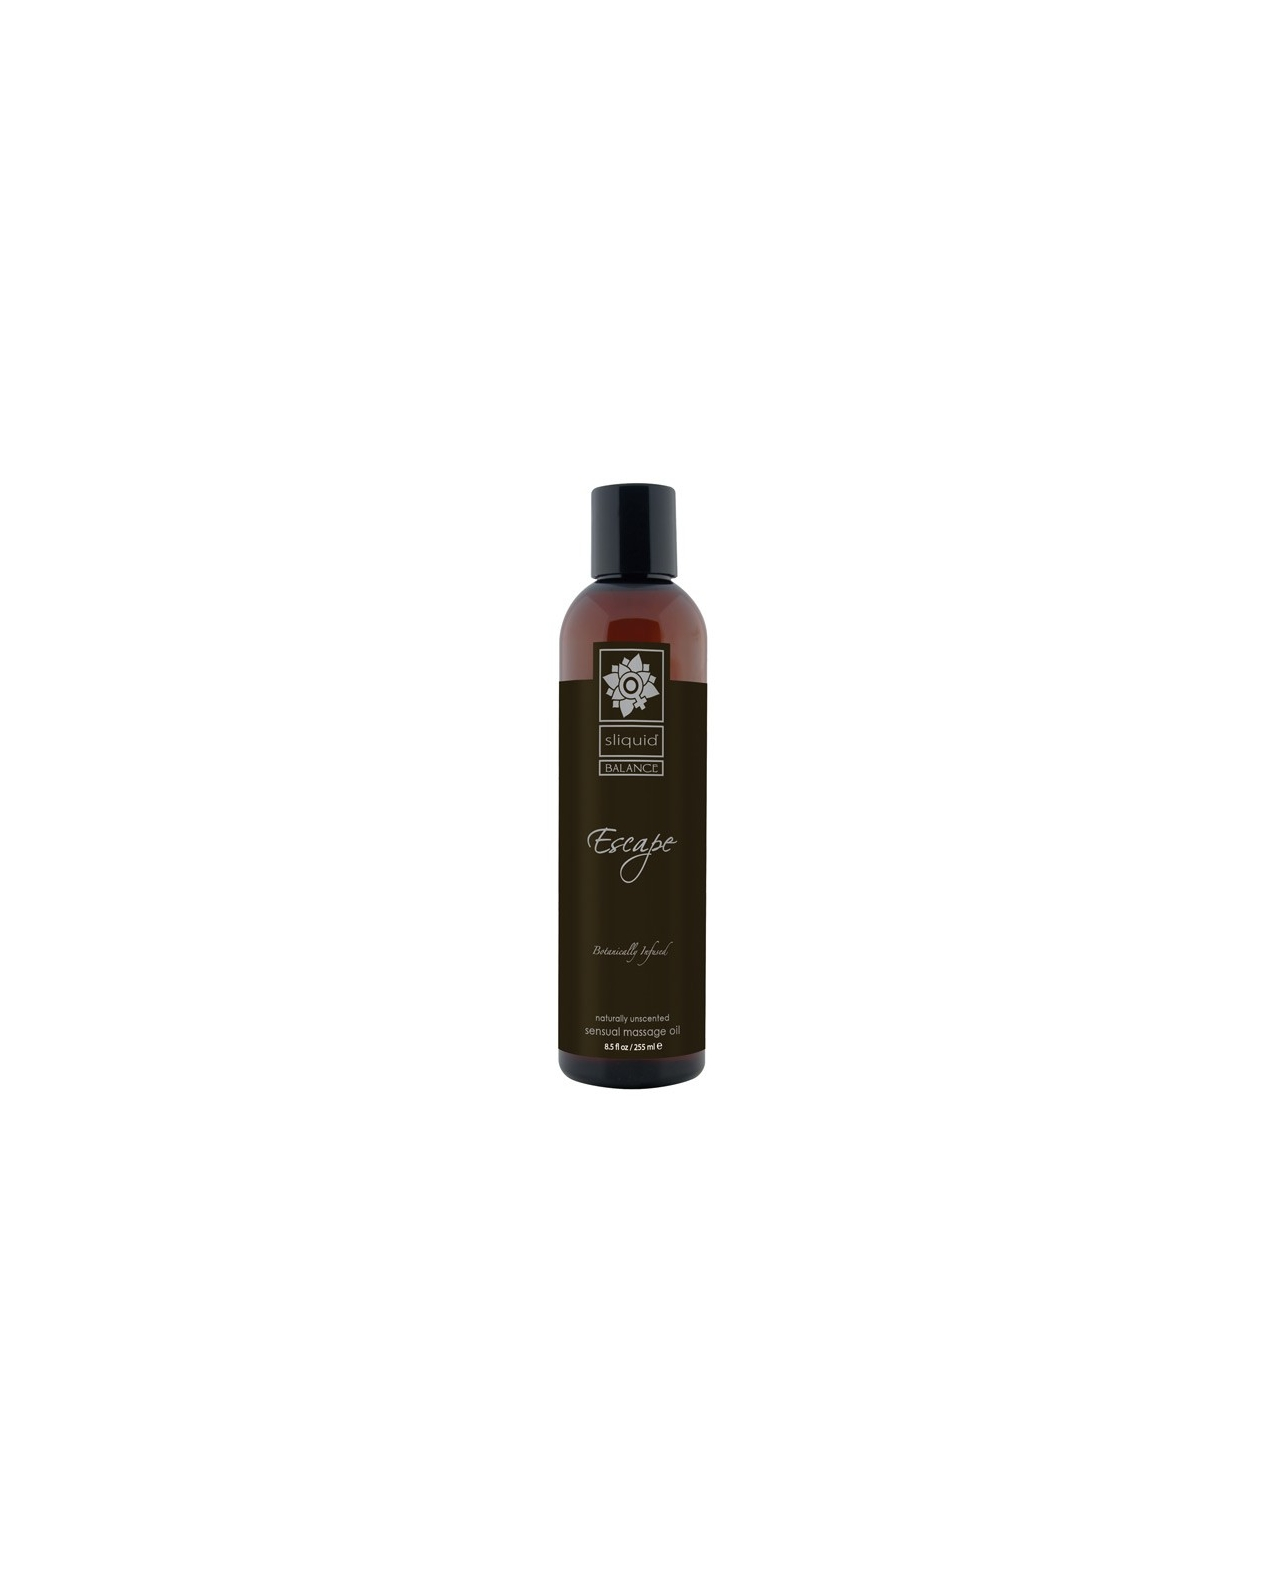 Sliquid Organics Massage Oil - 8.5 oz Escape